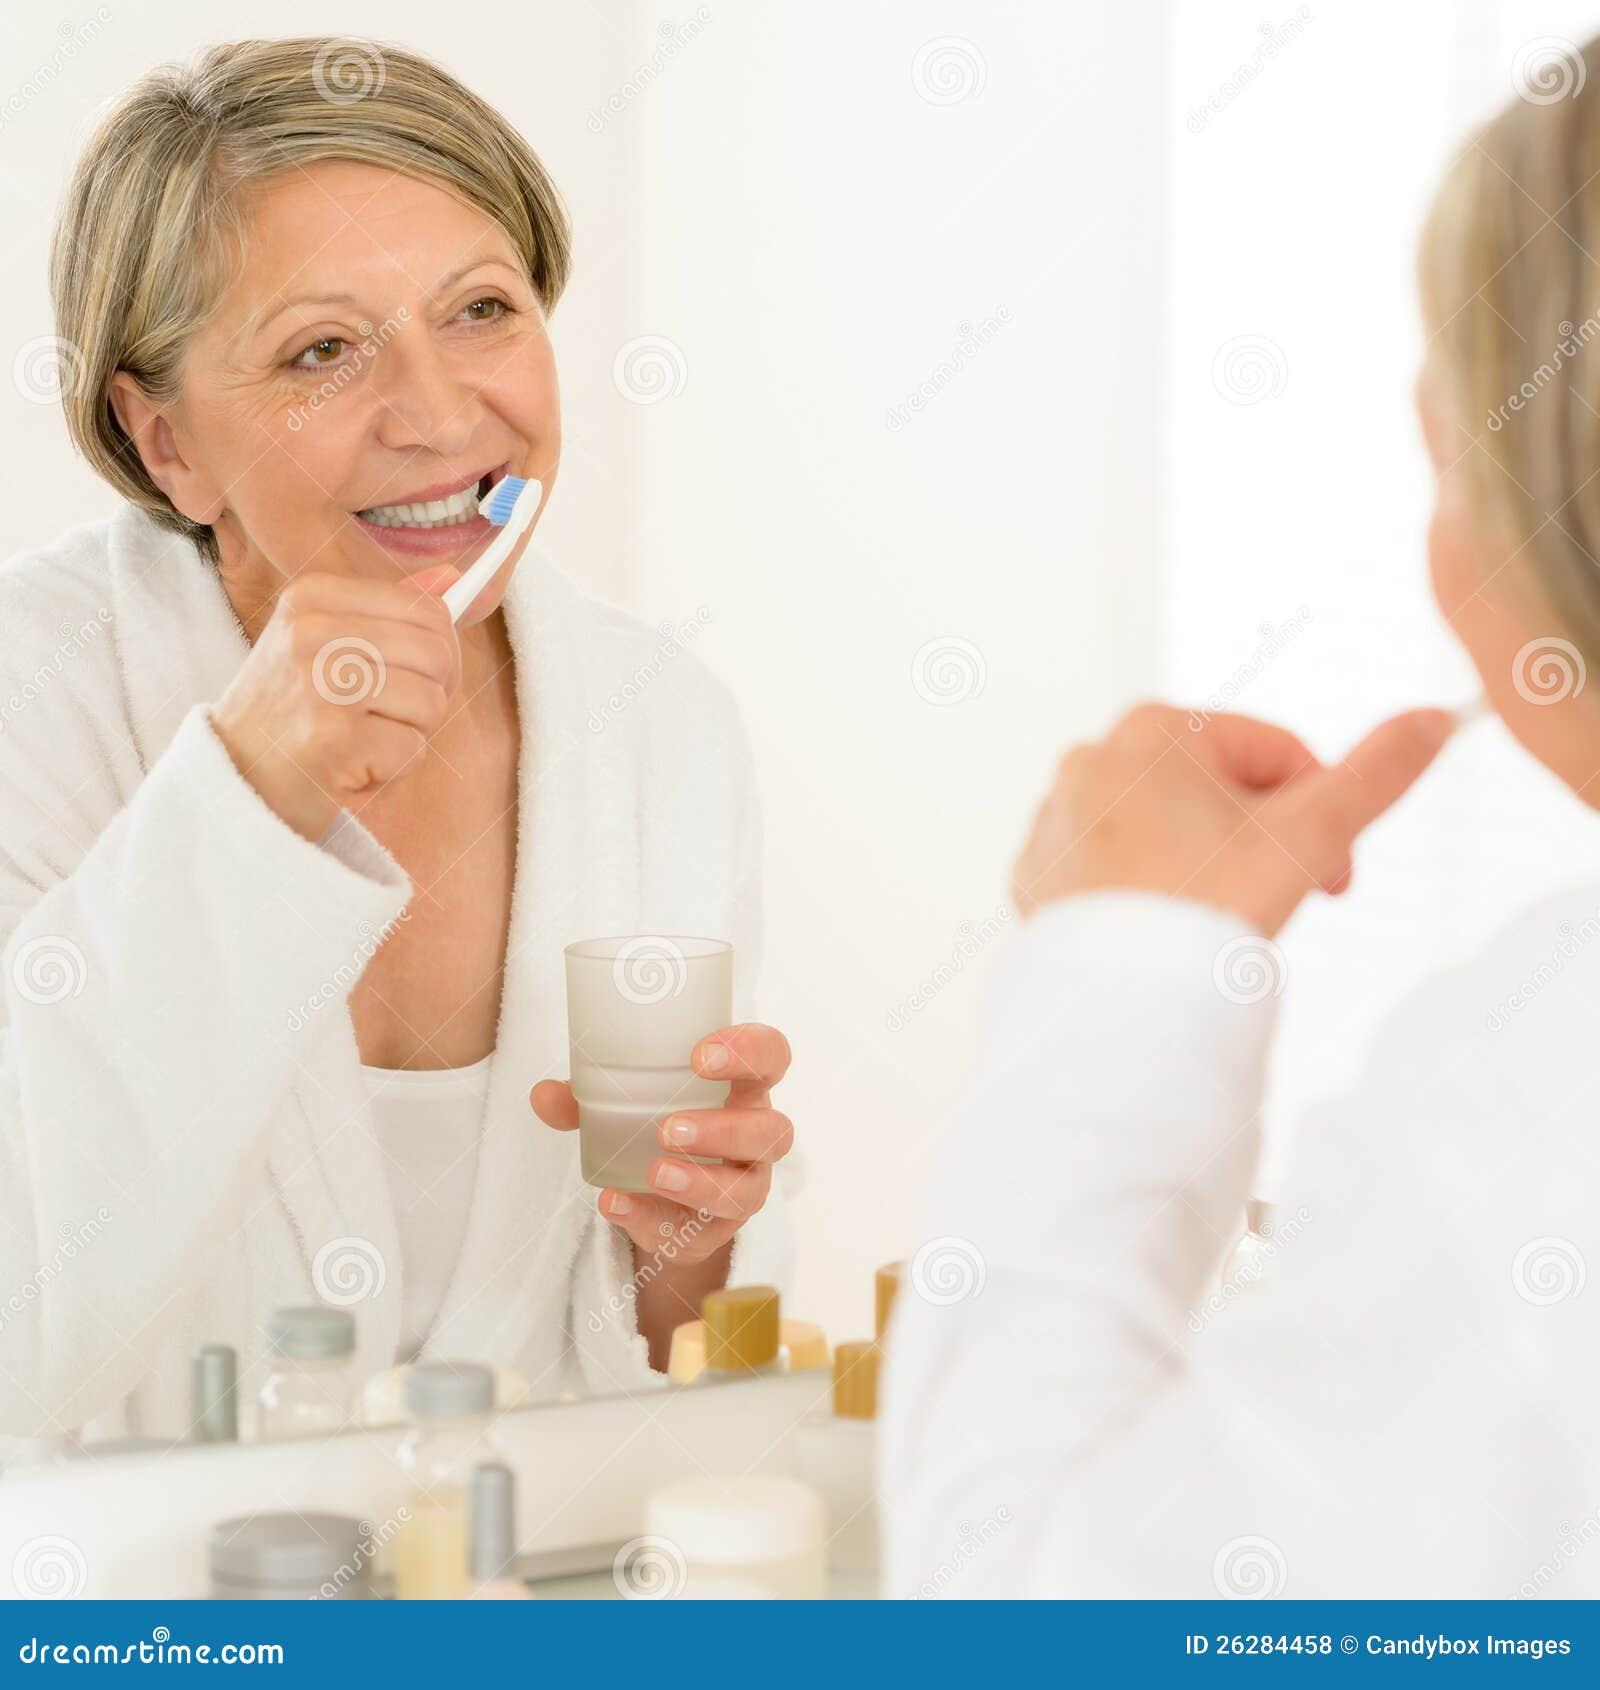 Senior woman brushing teeth bathroom mirror